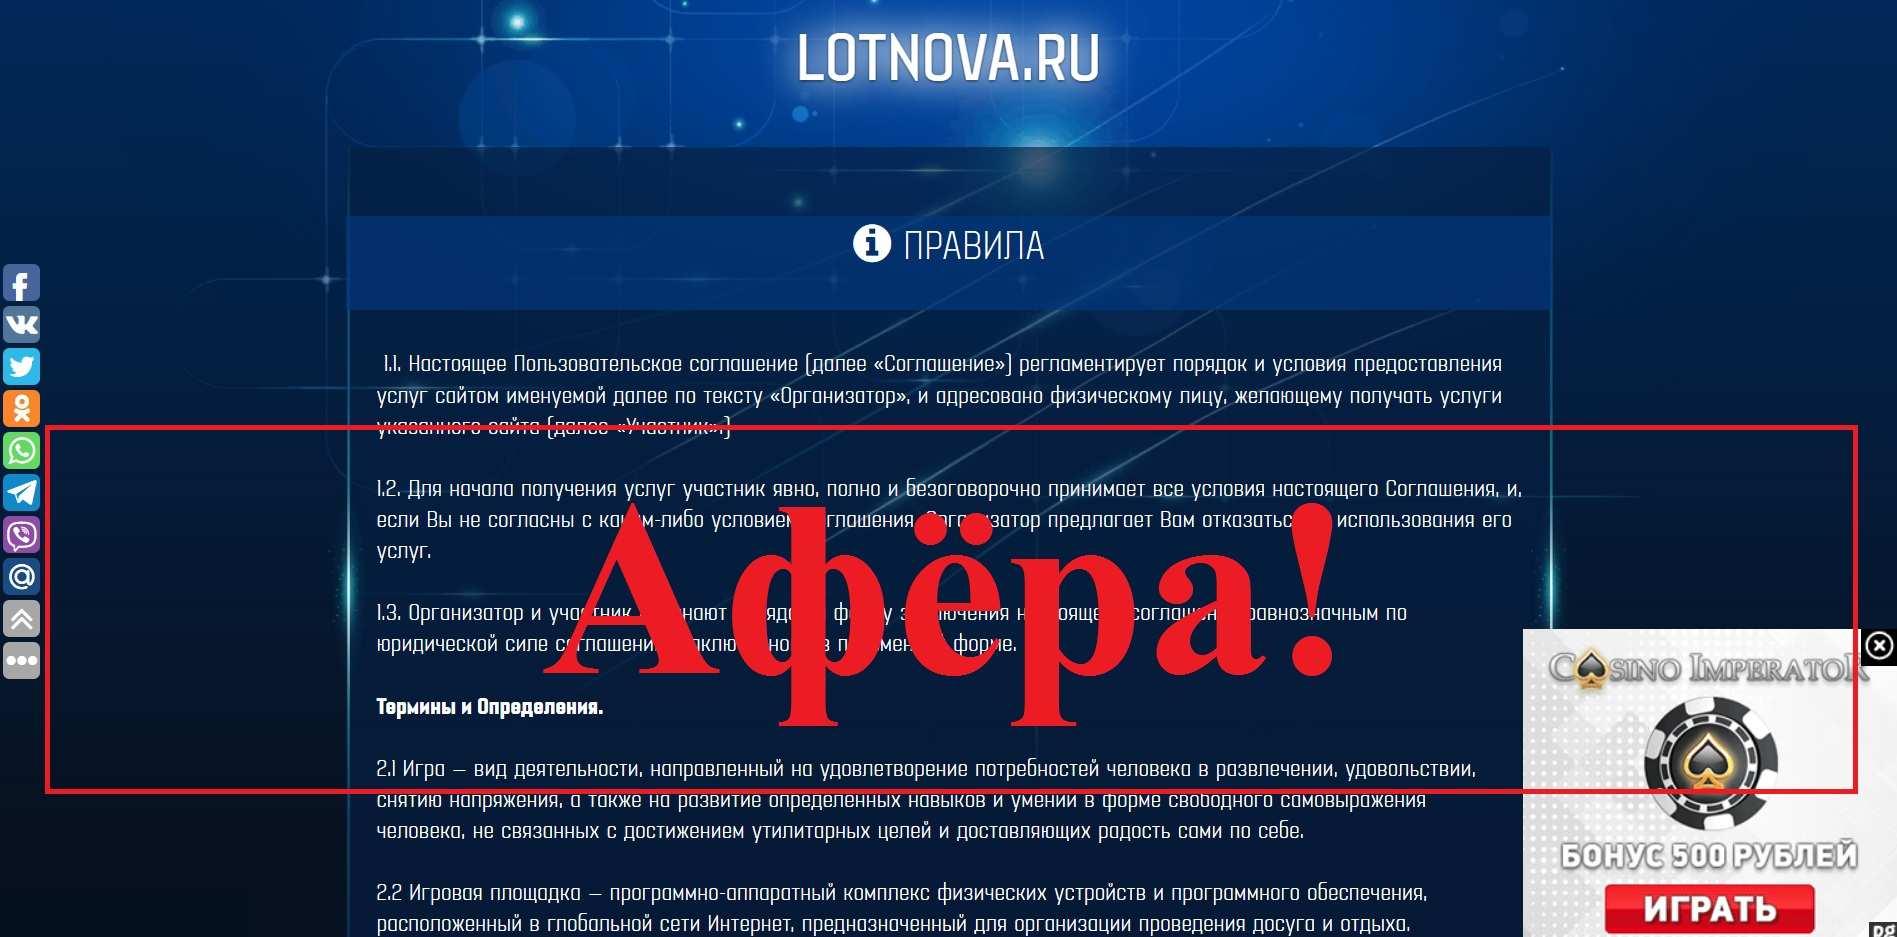 Lotnova.ru – отзывы о проекте